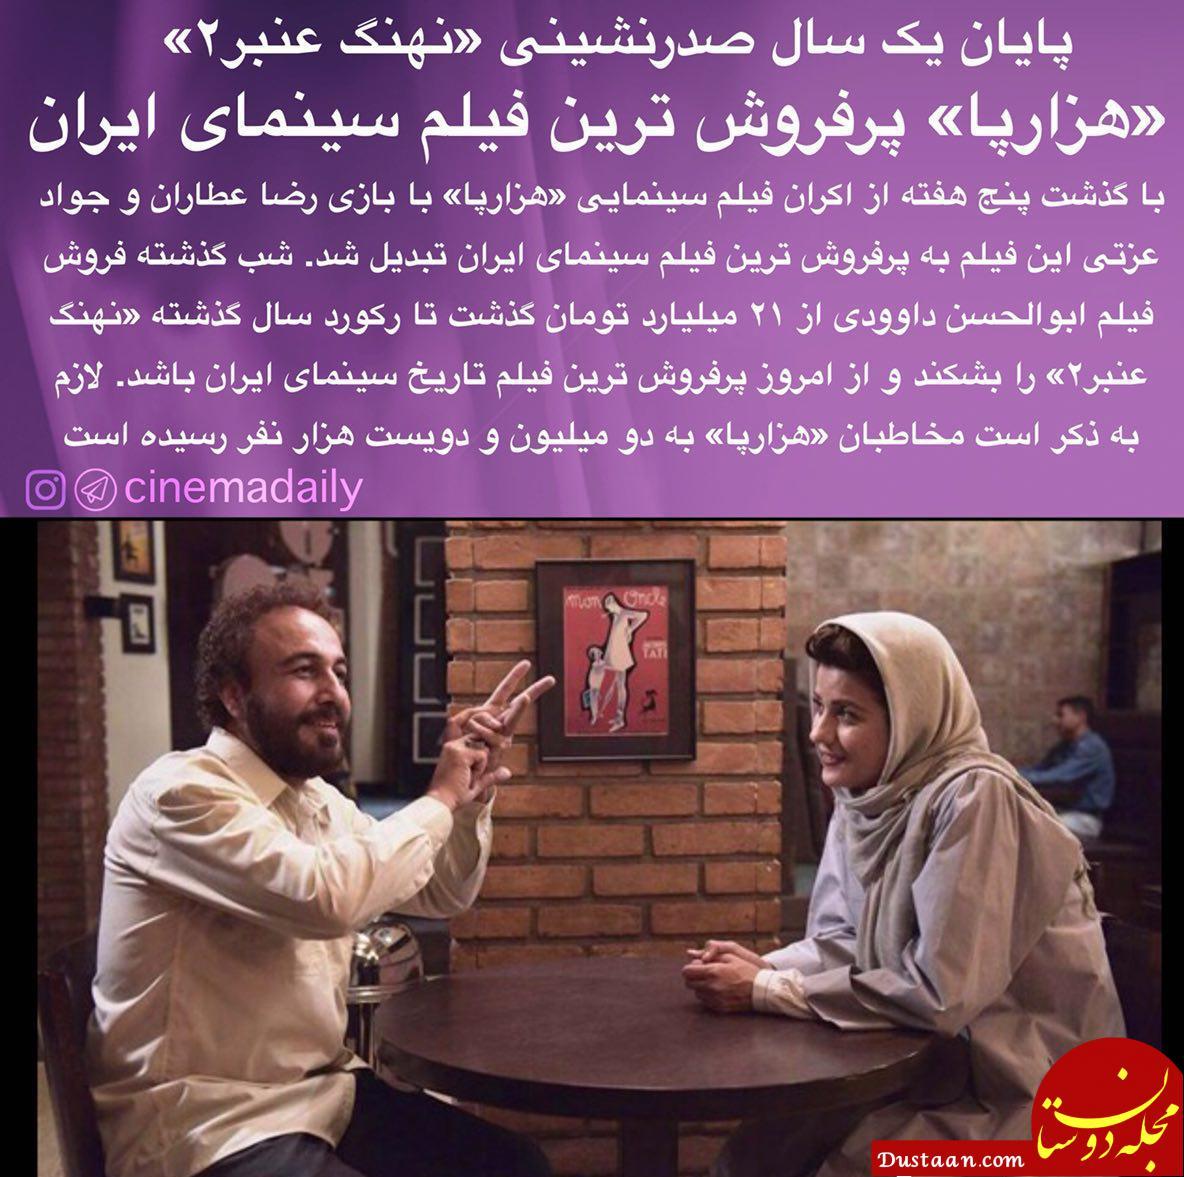 www.dustaan.com «هزارپا» پرفروش ترین فیلم سینمای ایران شد +عکس